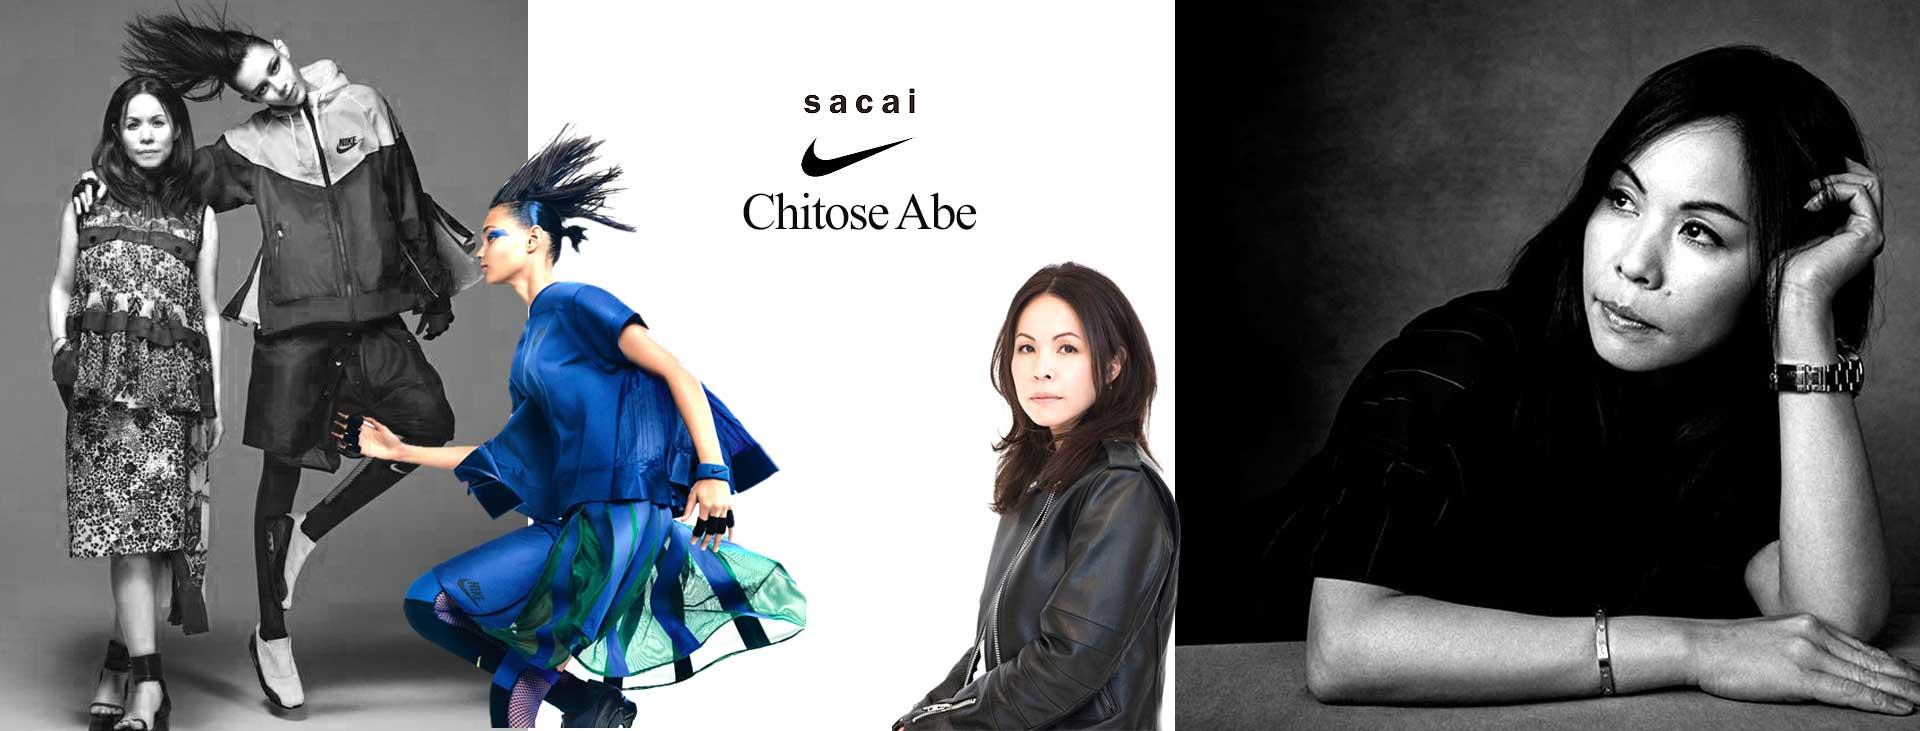 Chitose Abe 1 - زنان پیشگام در صنعت مد